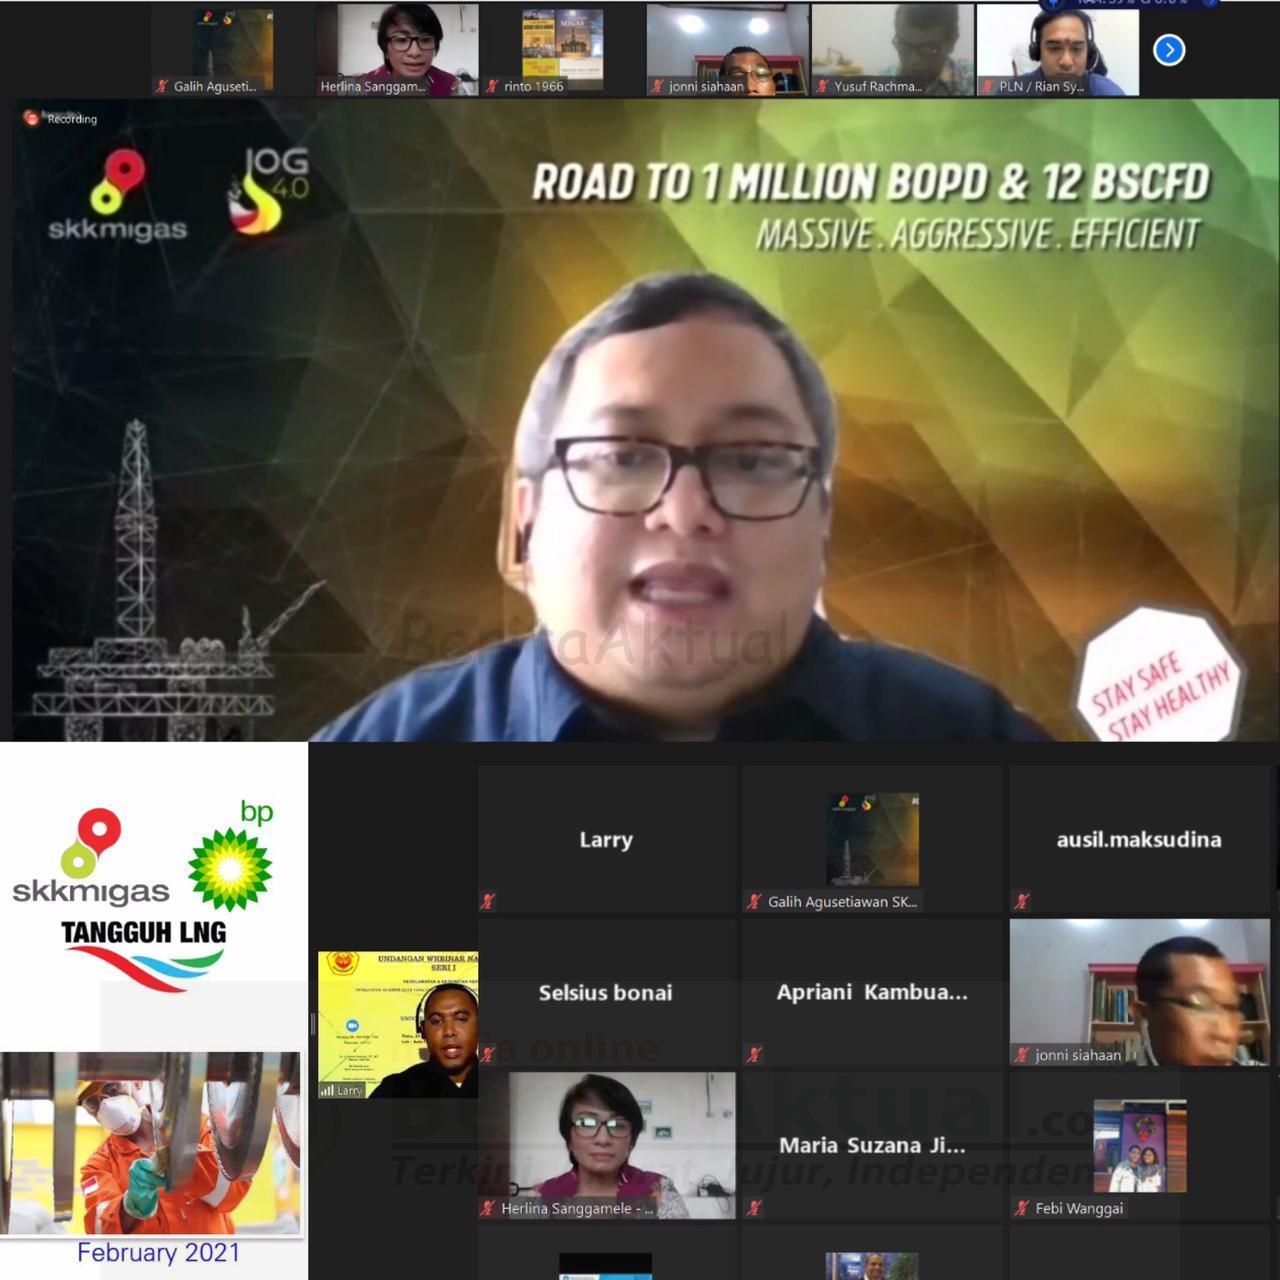 Industri Hulu Migas Wil Papua Maluku Dukung Pencanangan Bulan K3 Bersama Civitas Akademika Uncen 10 IMG 20210225 WA0001